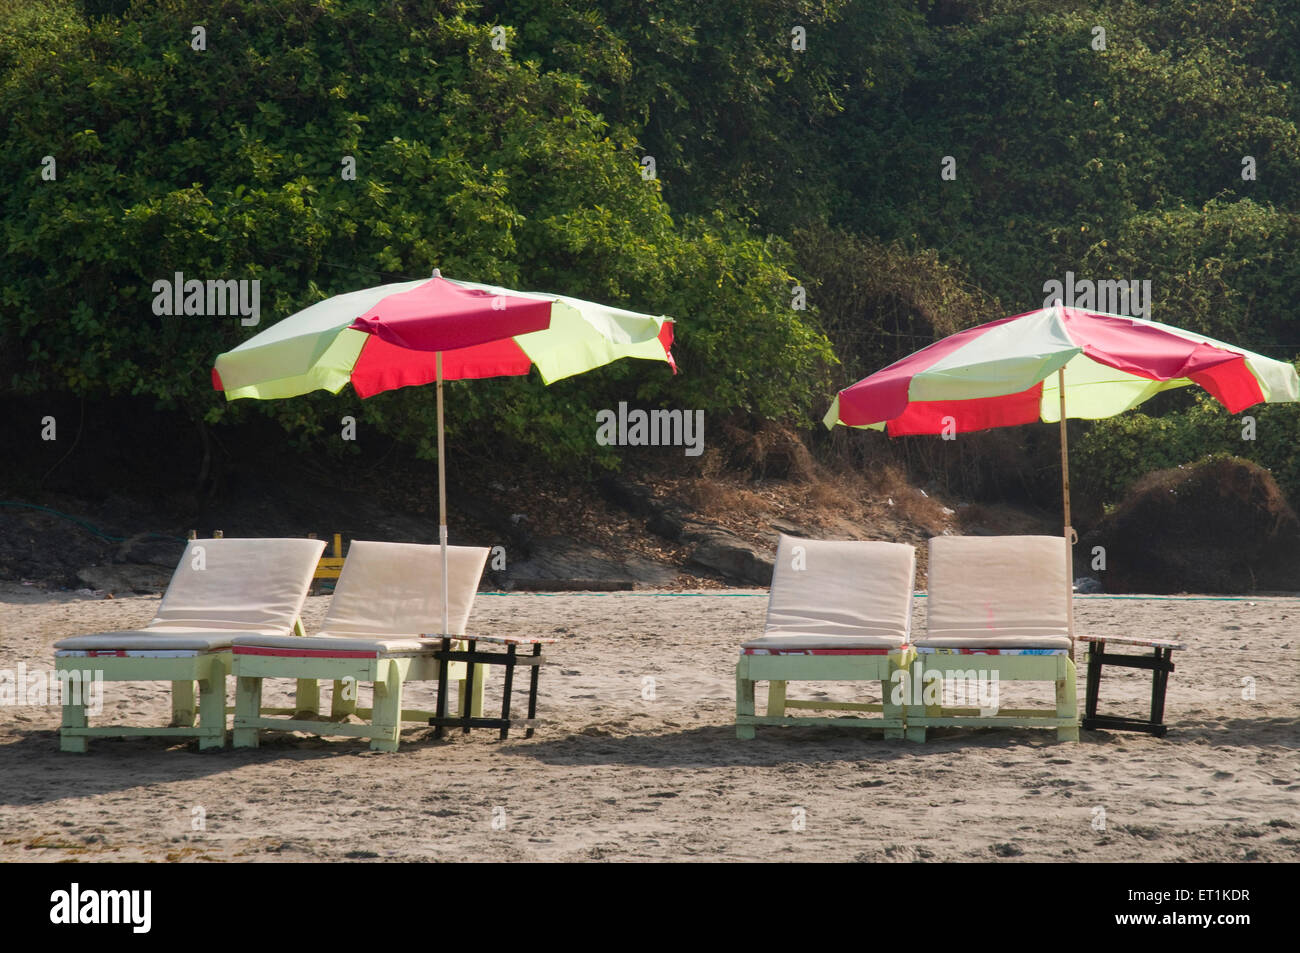 Schirme mit Stühlen Vagator Beach Goa Maharashtra Indien Asien März 2011 Stockbild